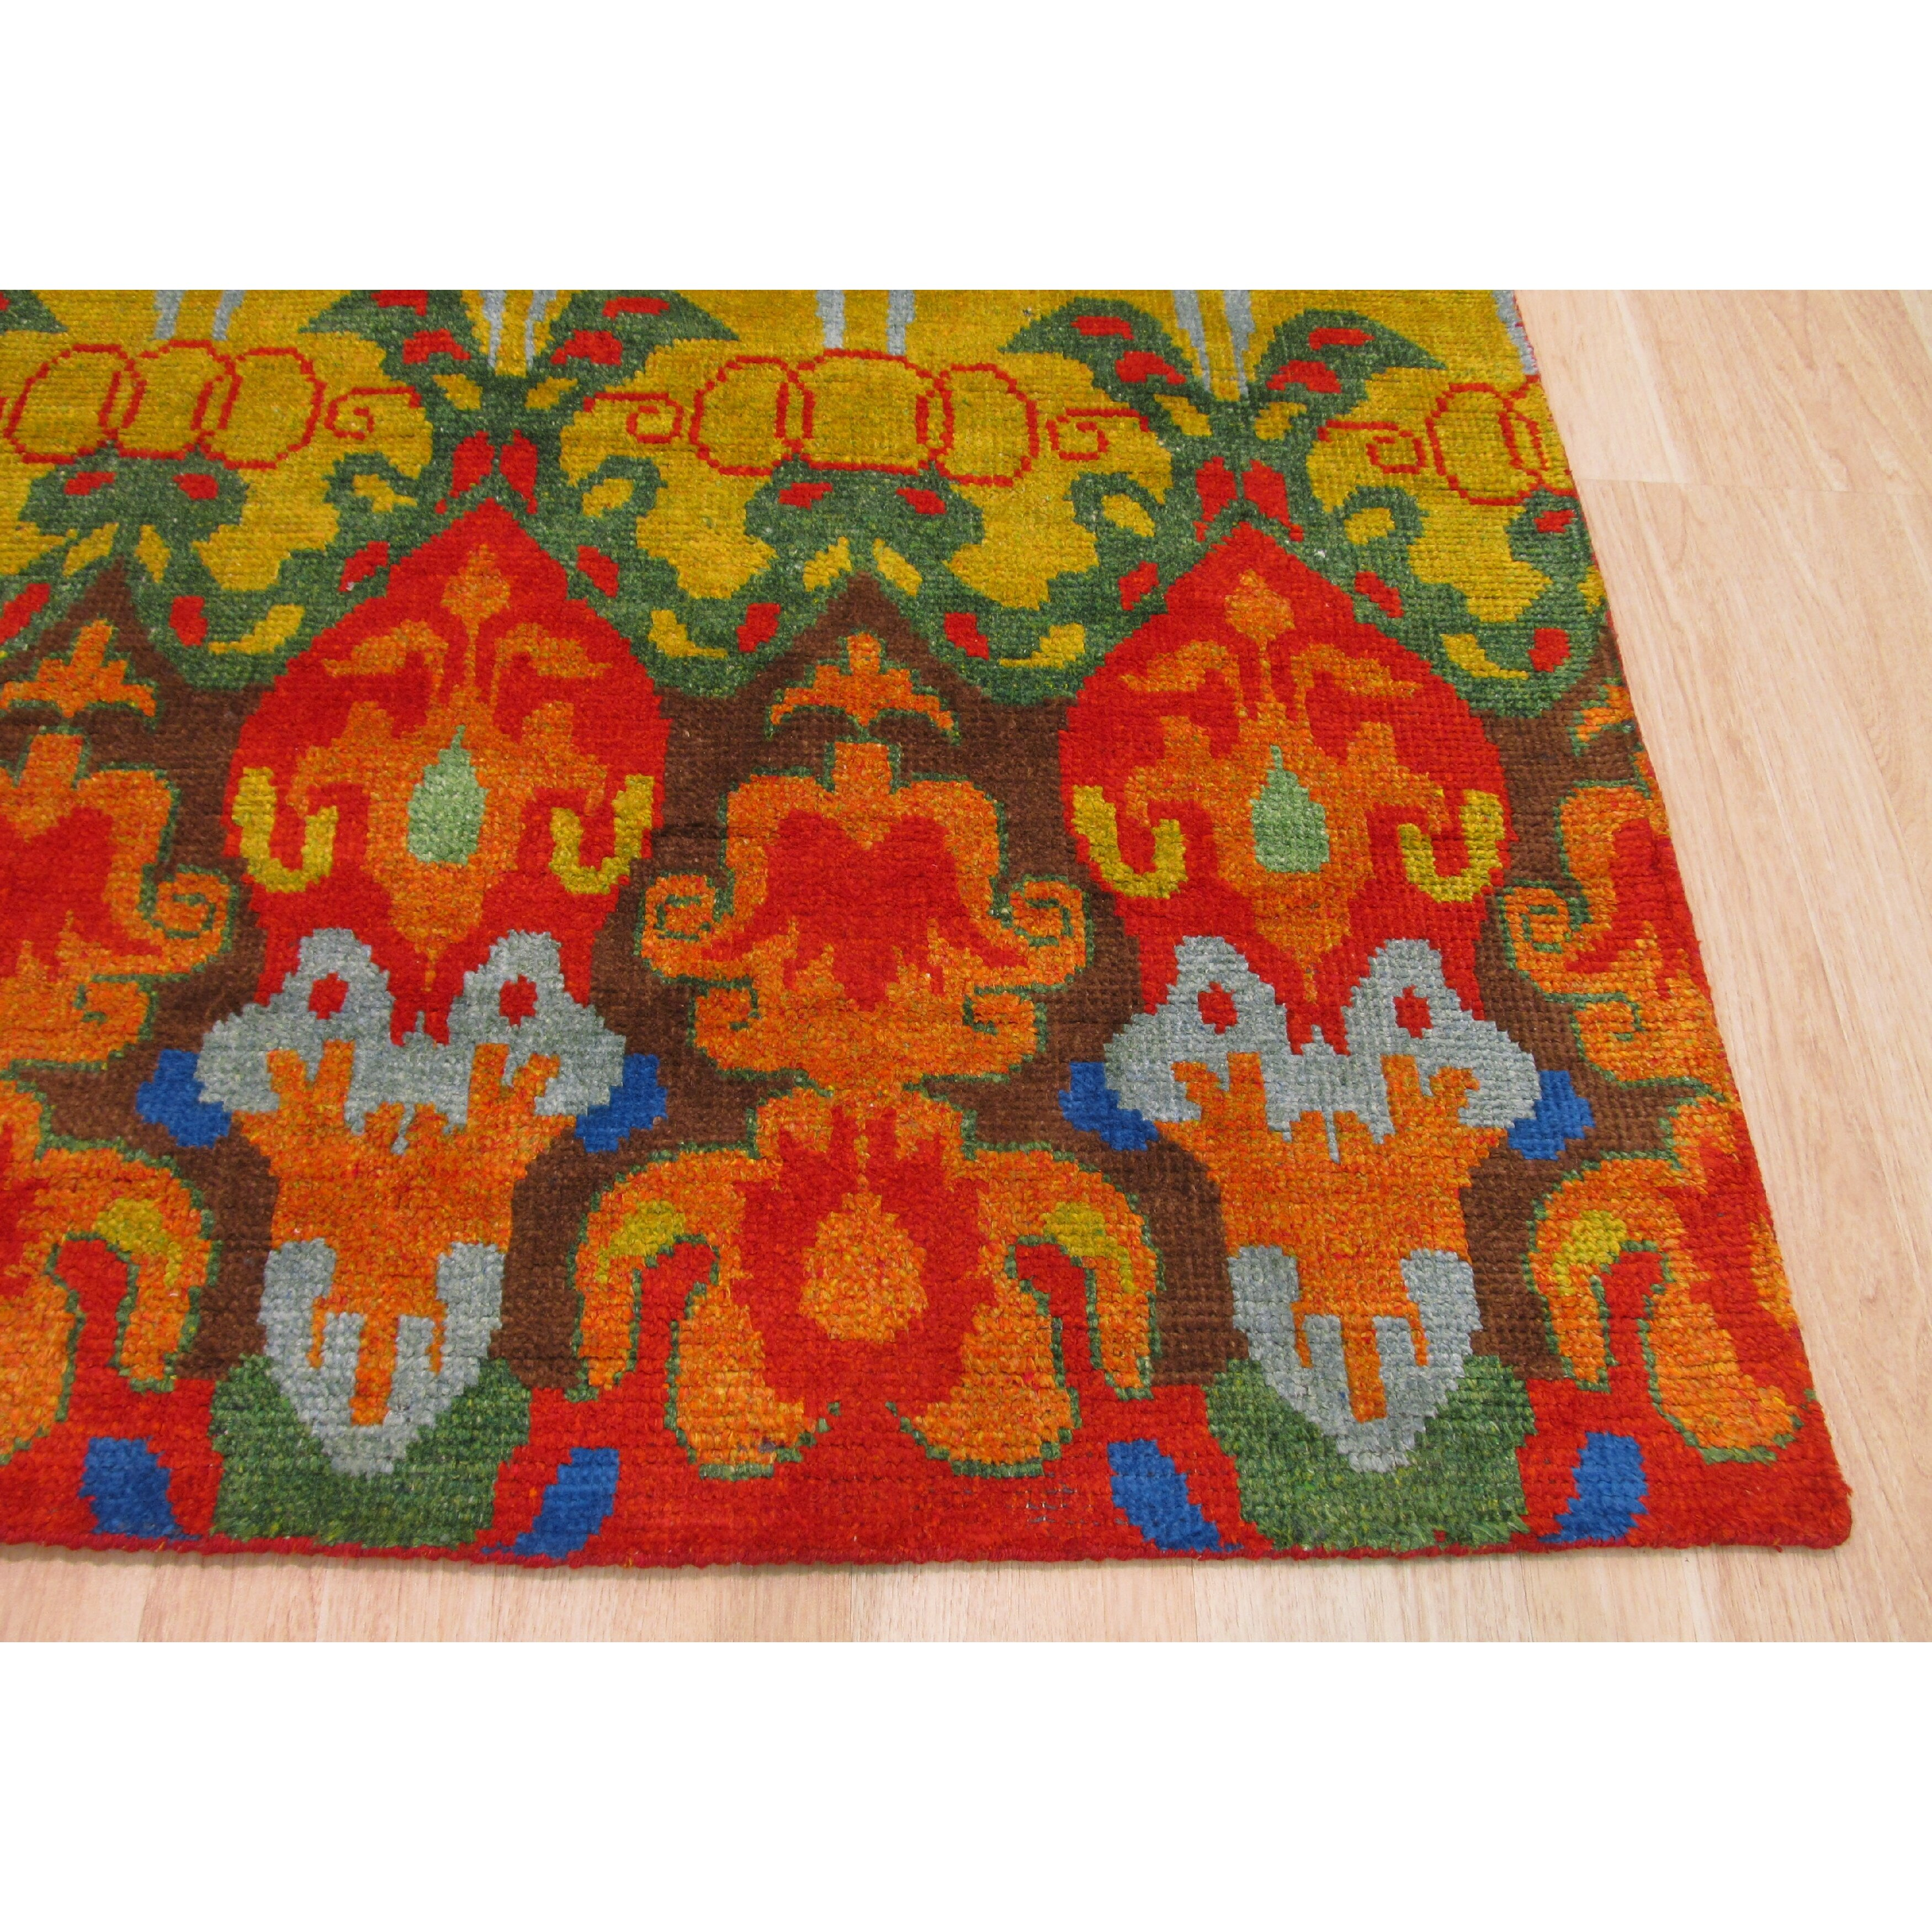 Orange And Green Area Rugs Jaipur Rug1 Poeme Tufted Arts